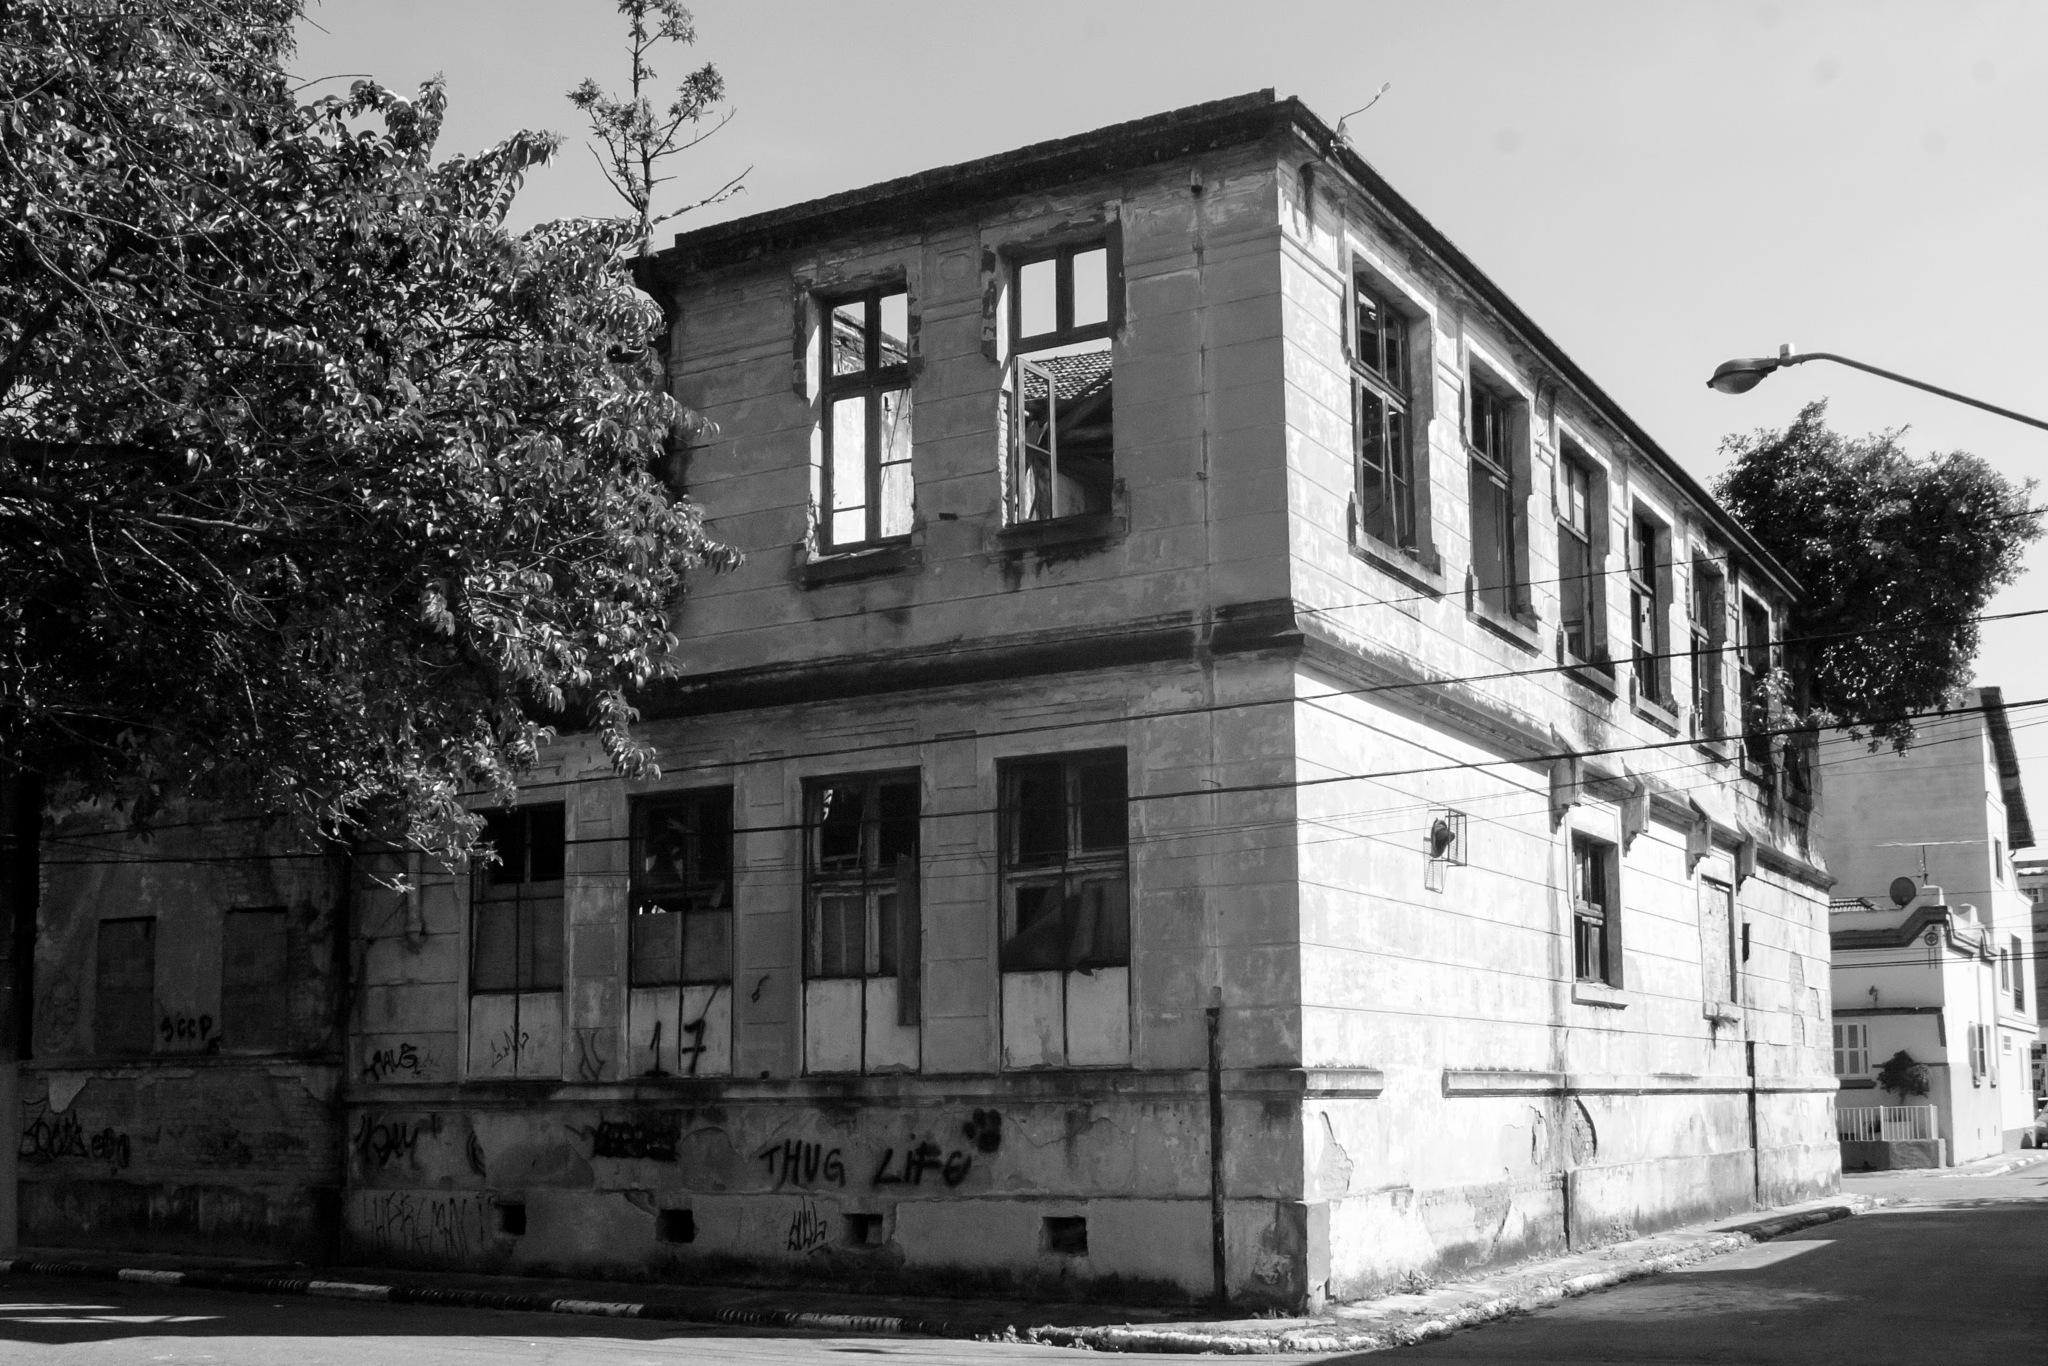 Vila Industrial by Marcos Lourenco